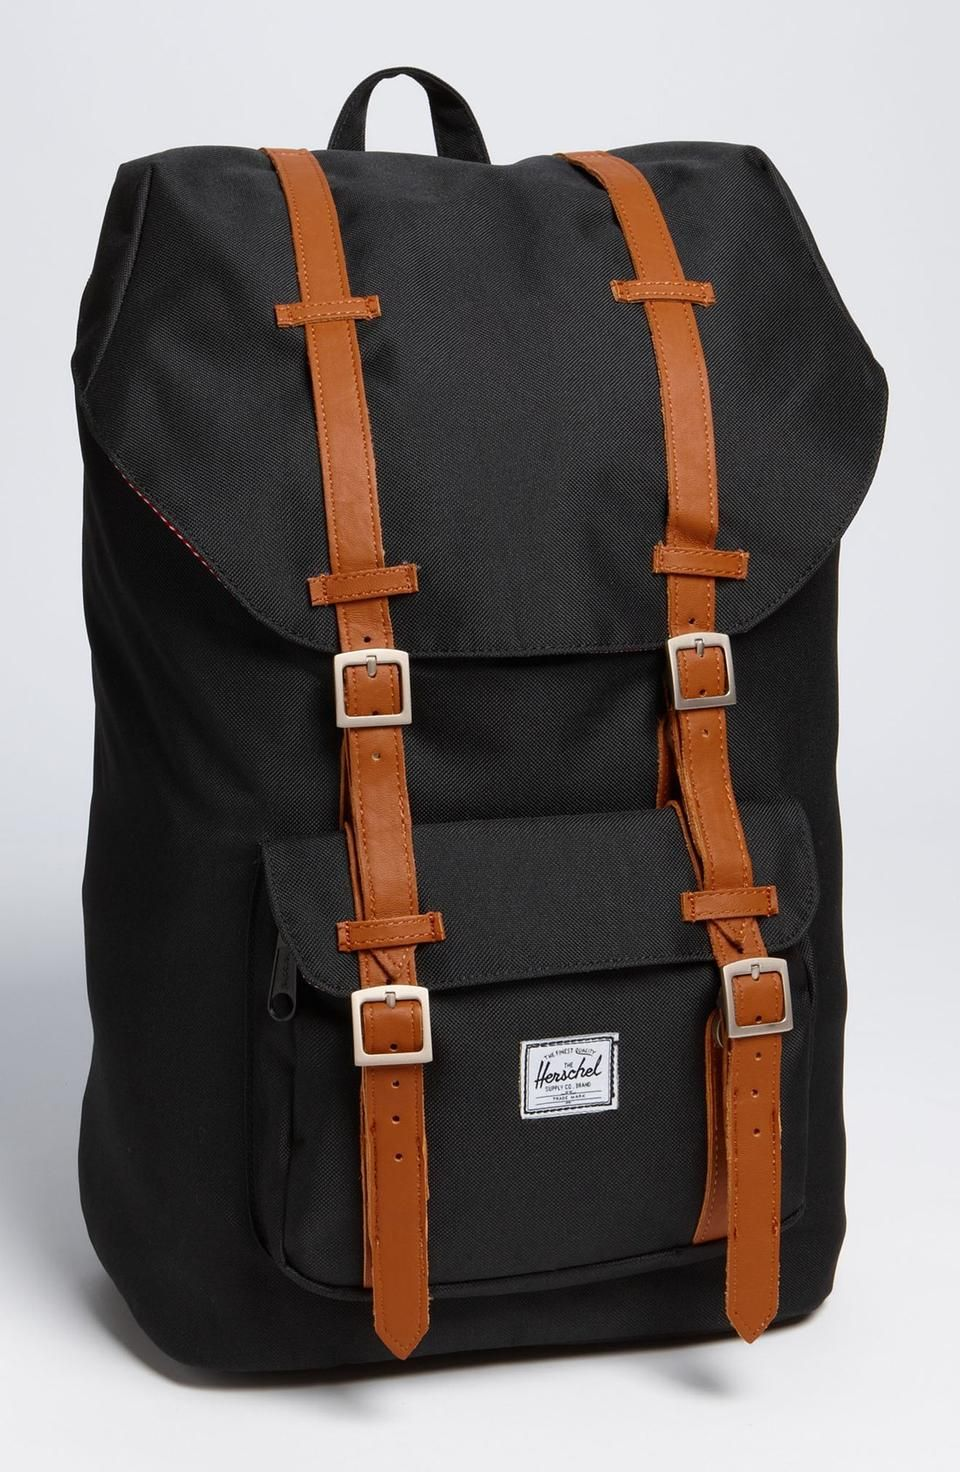 a46ce32ad47 Herschel Supply Co.   'Little America' Backpack #herschelsupplyco #backpack